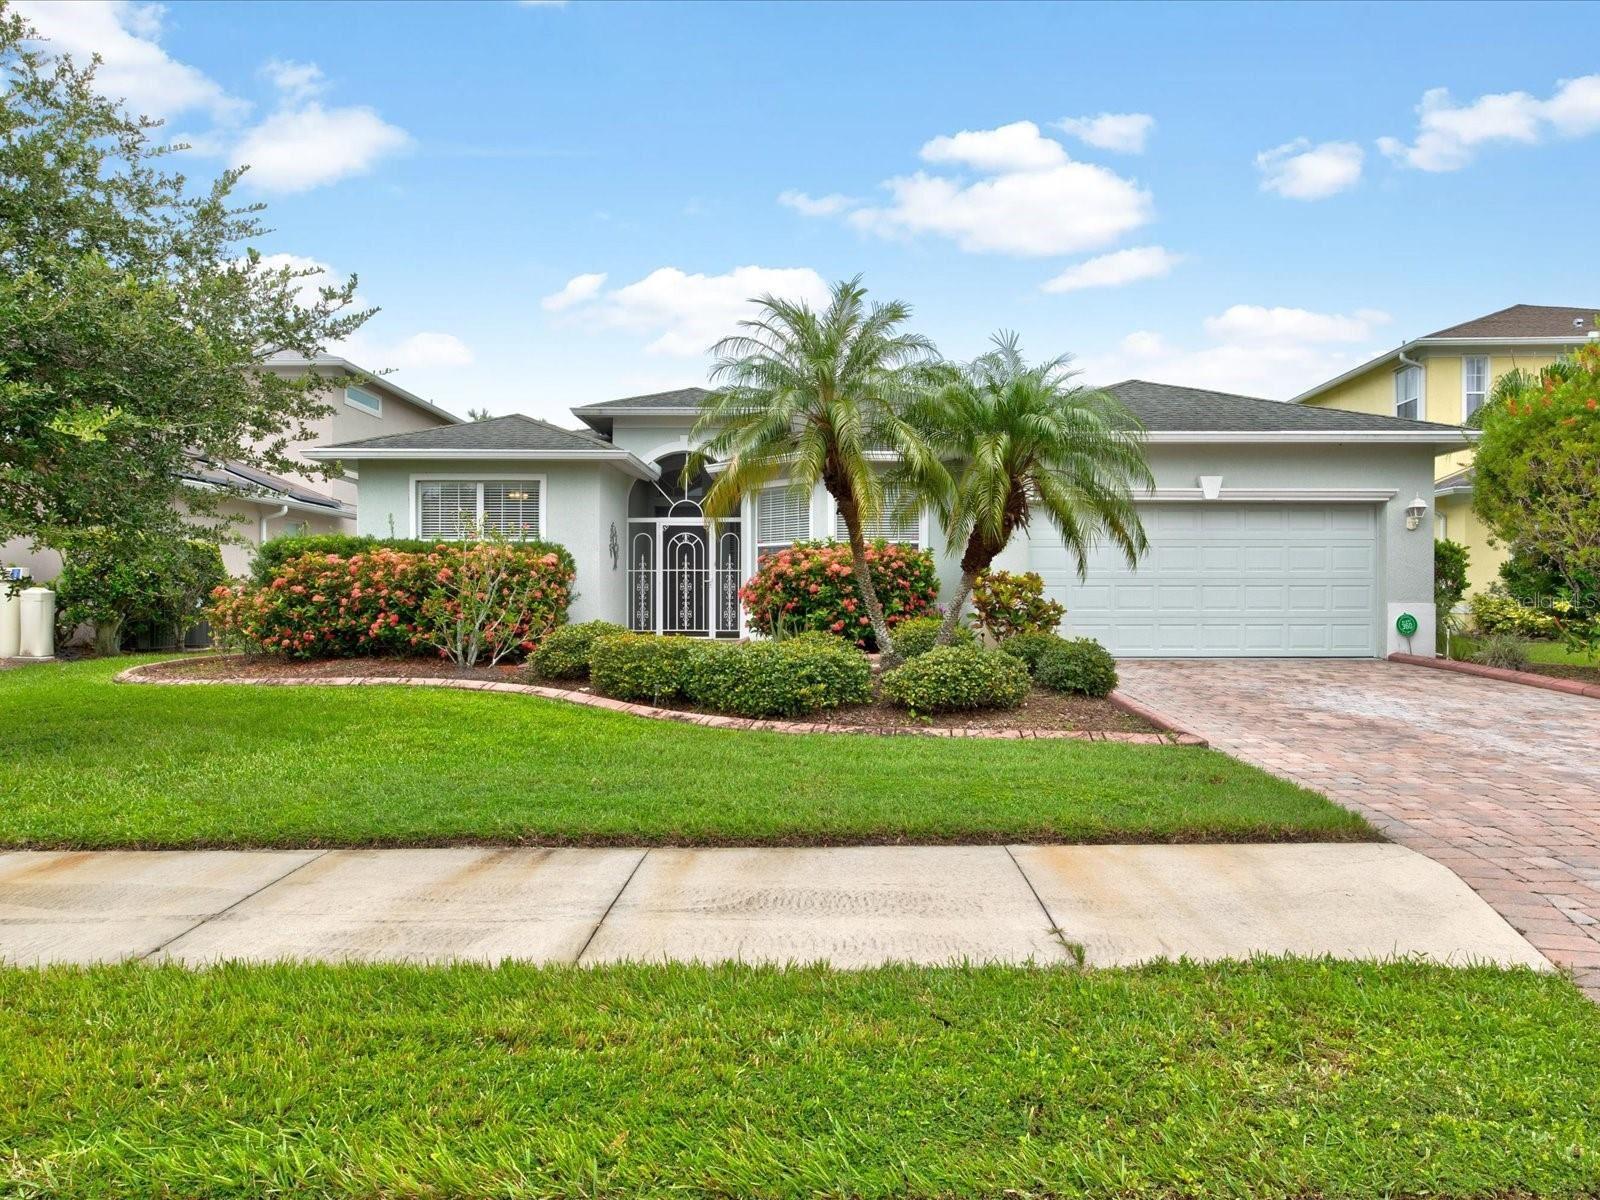 6603 37TH STREET E, Sarasota, FL 34243 - #: A4508571